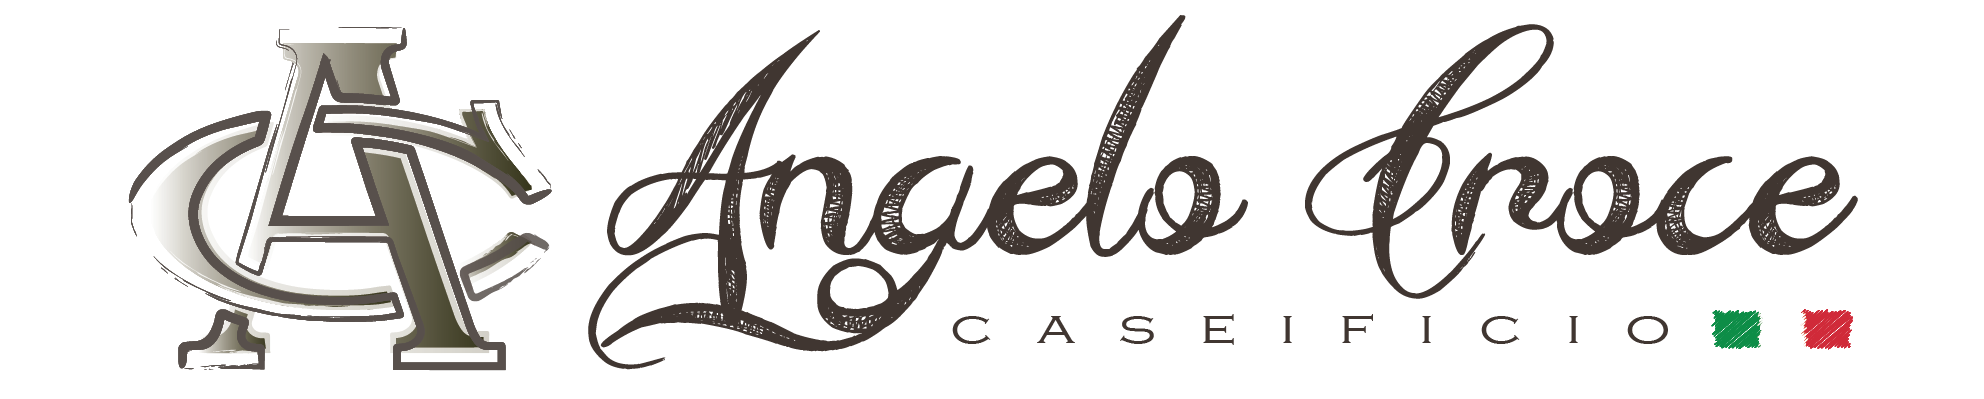 Caseificio Angelo Croce Logo